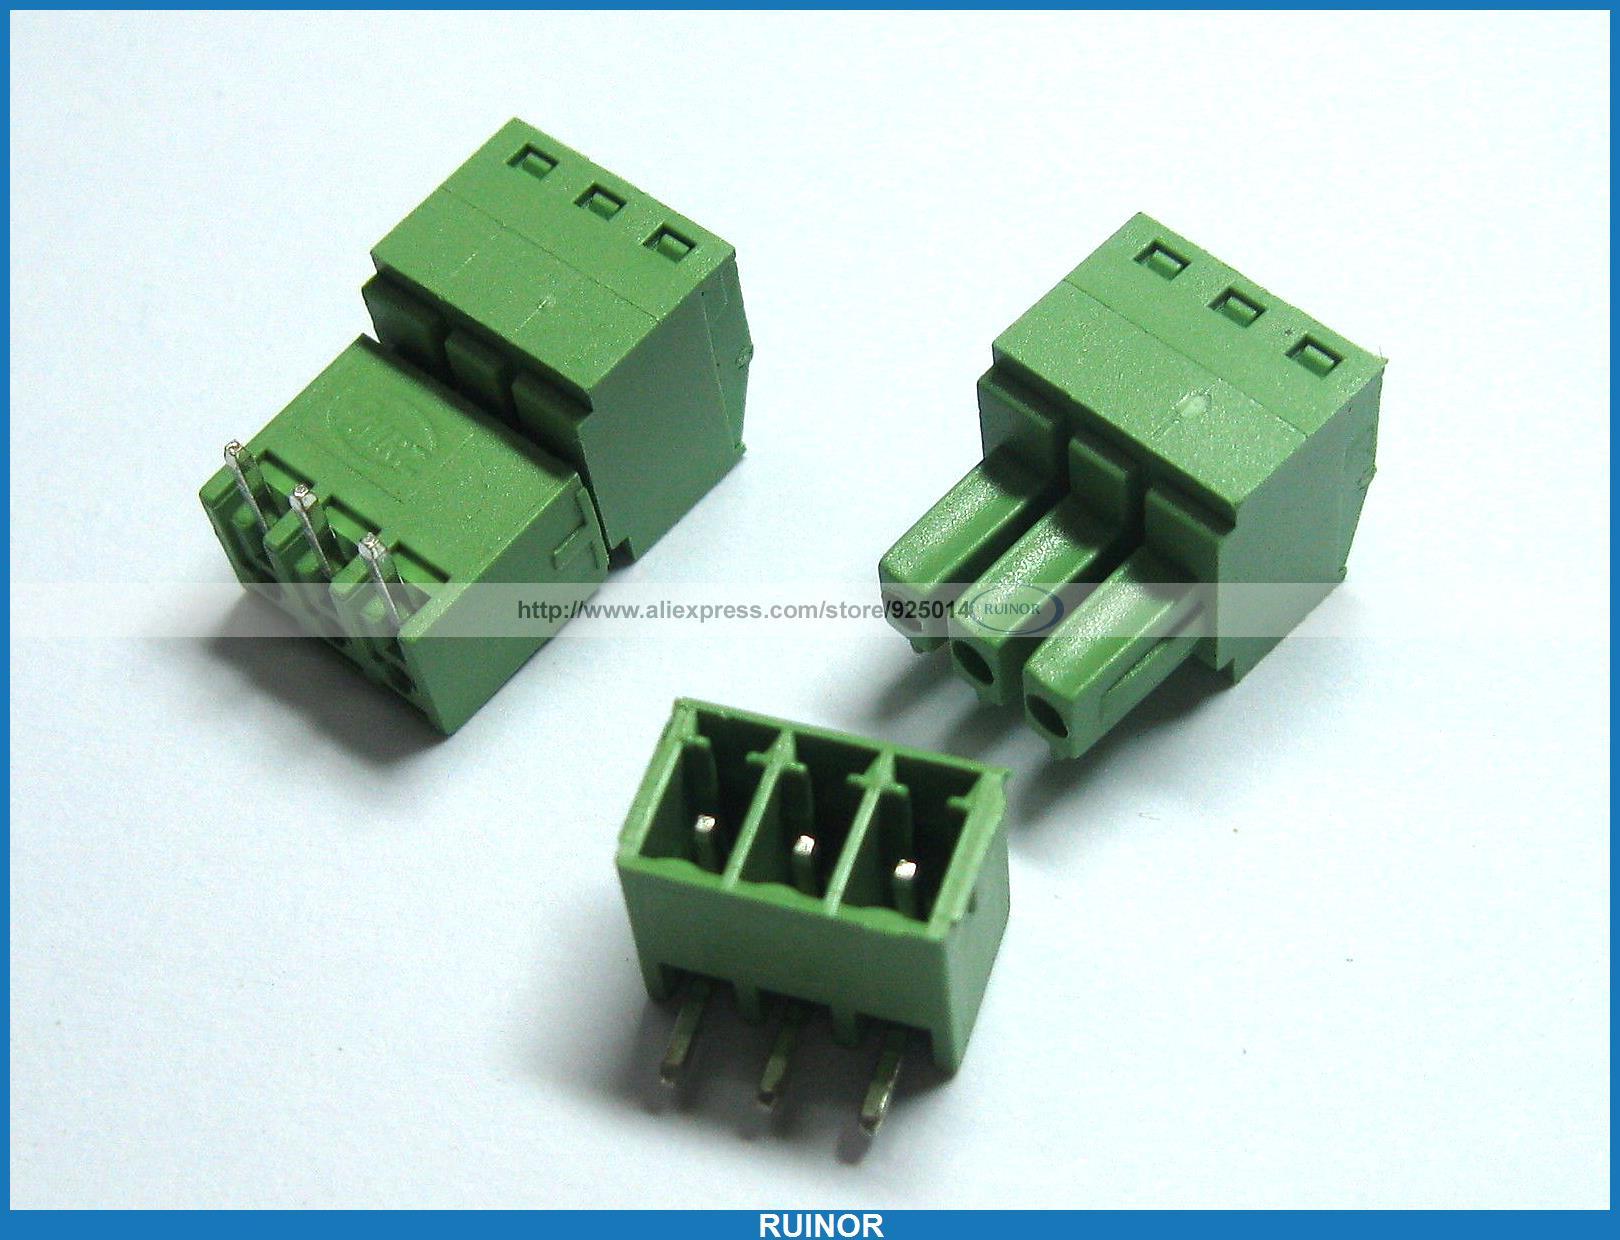 250 Pcs Screw Terminal Block Connector 3.5mm Angle 3 Pin Green Pluggable Type 30 pcs screw terminal block connector 3 81mm 12 pin green pluggable type